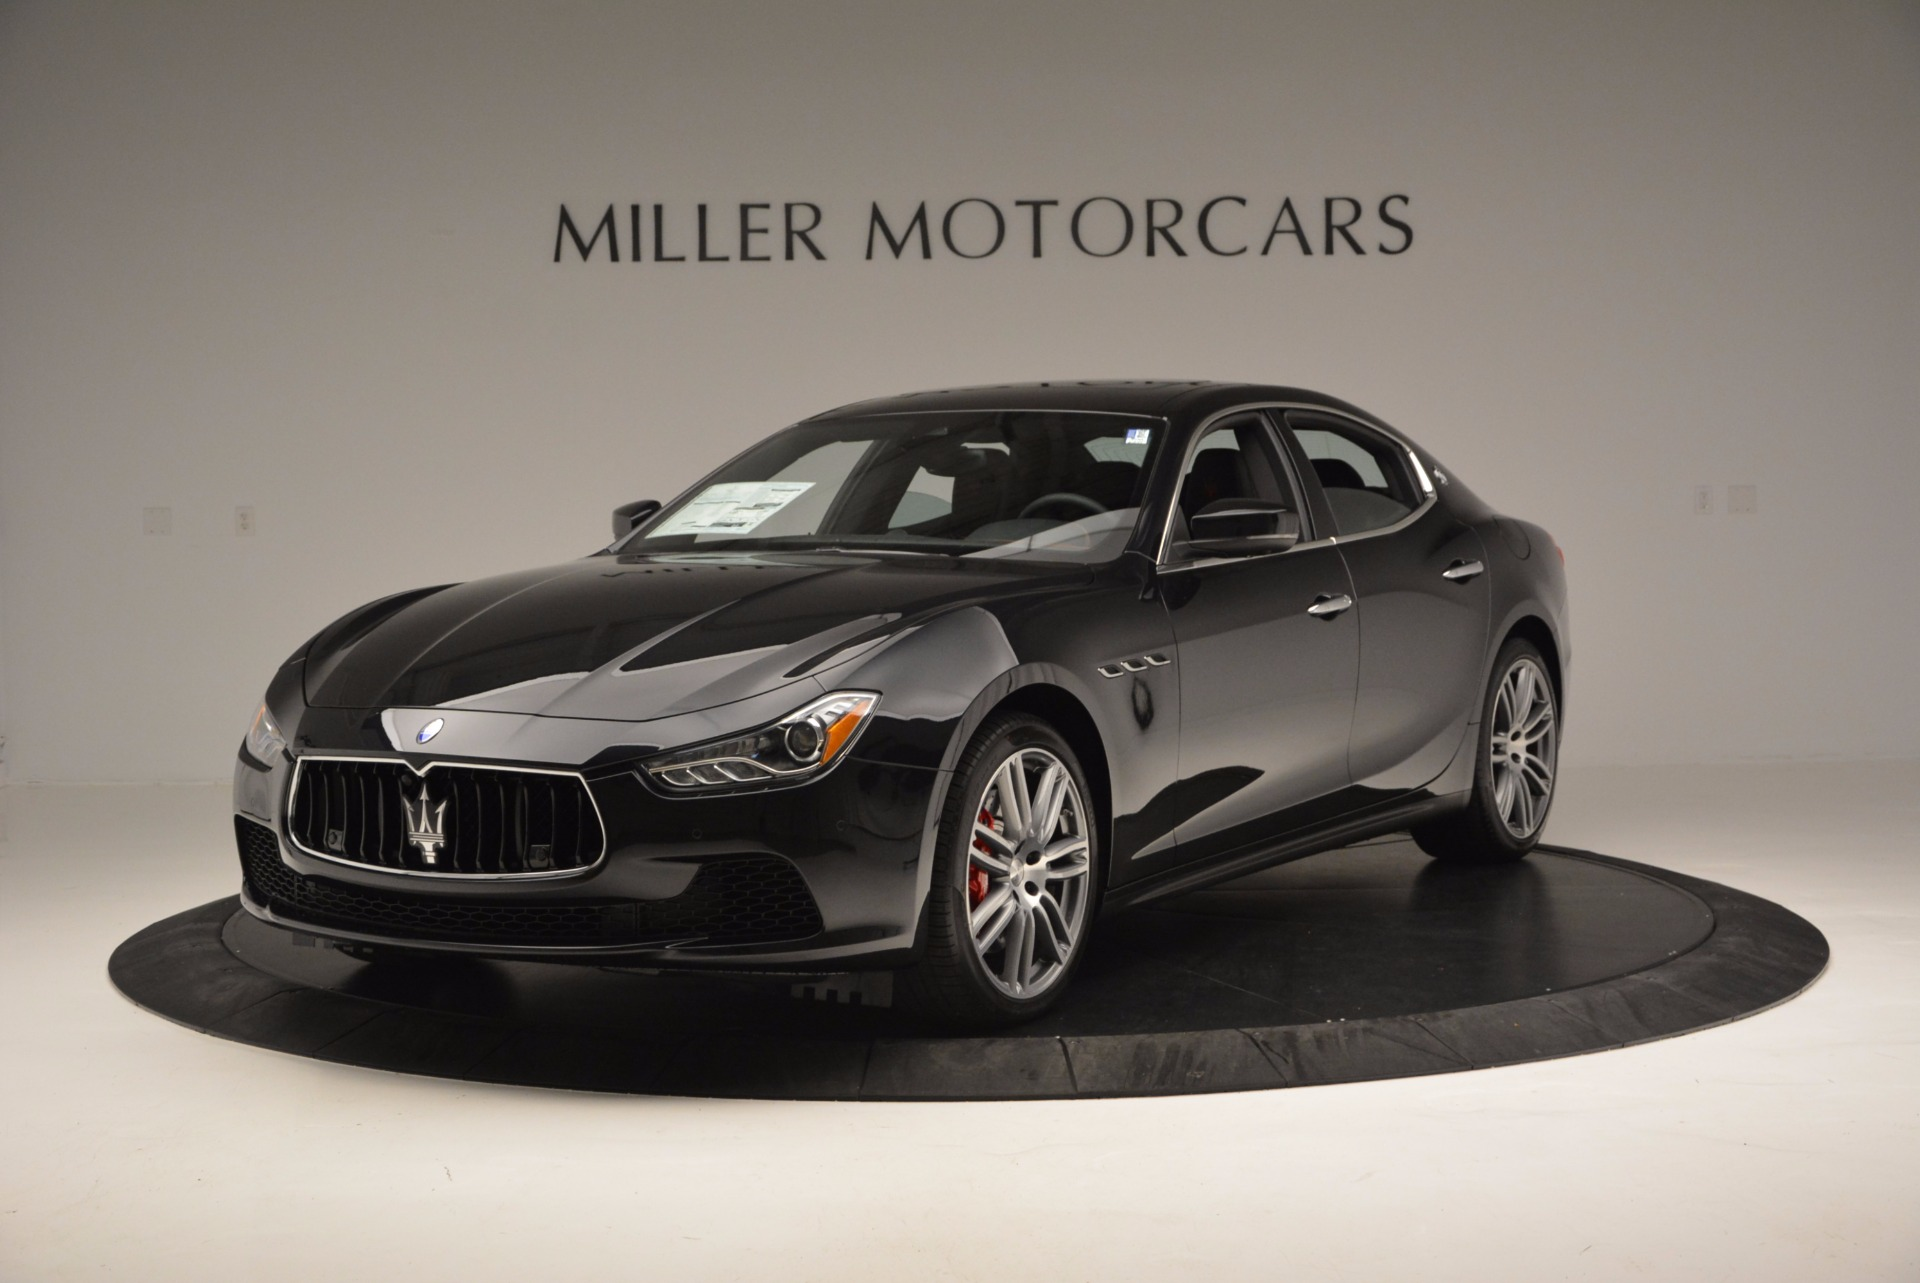 New 2017 Maserati Ghibli S Q4 For Sale In Greenwich, CT 1114_main